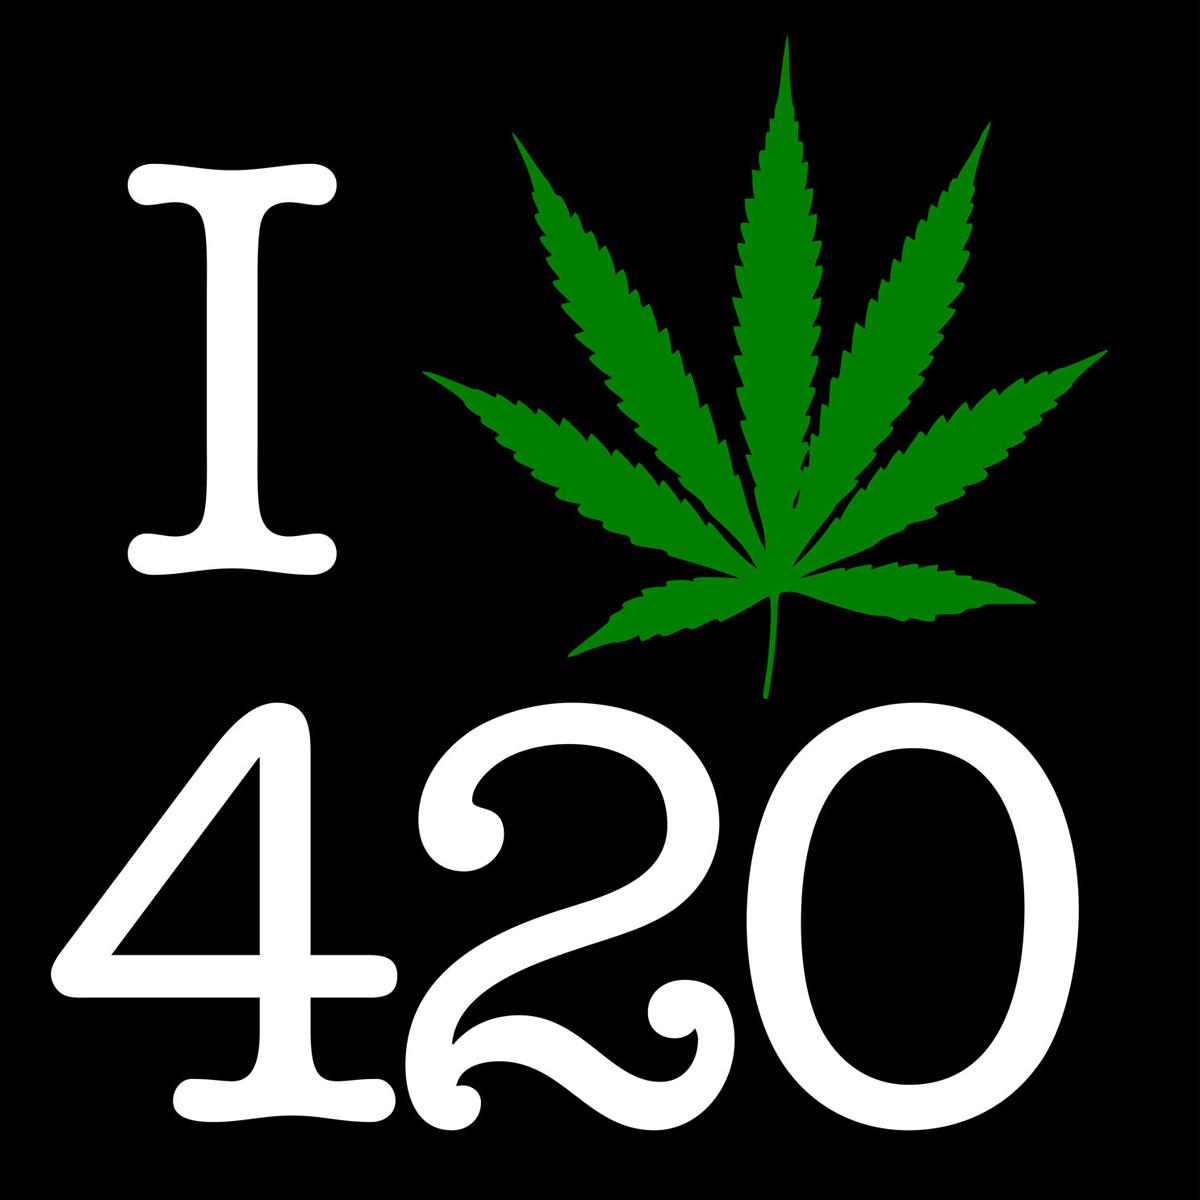 i love 420 pot leaf black t shirt men u2019s  rastaempire com bob marley looking at your bob marley look a likes